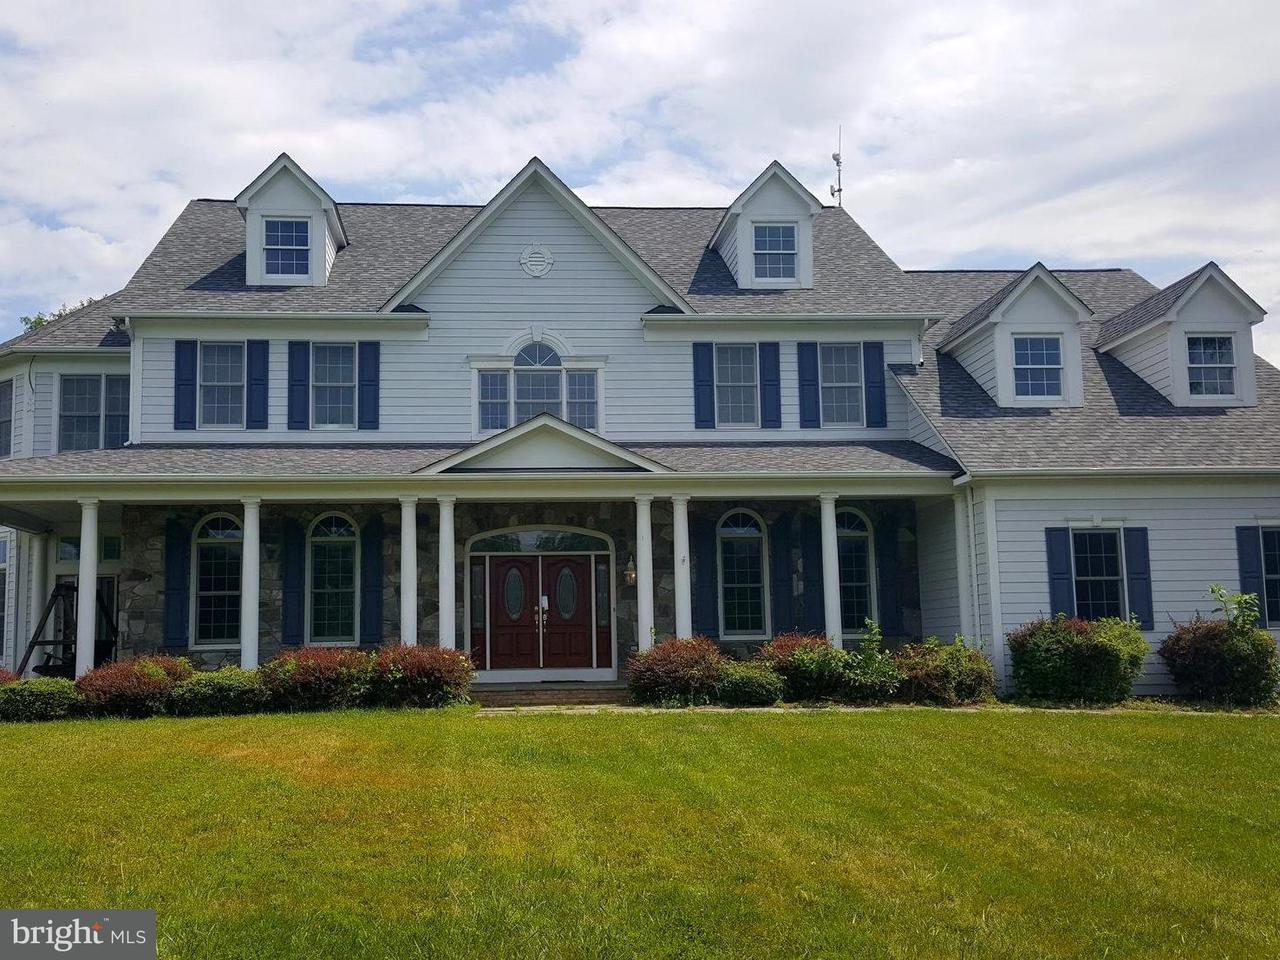 独户住宅 为 销售 在 40918 Pacer Lane 40918 Pacer Lane Paeonian Springs, 弗吉尼亚州 20129 美国